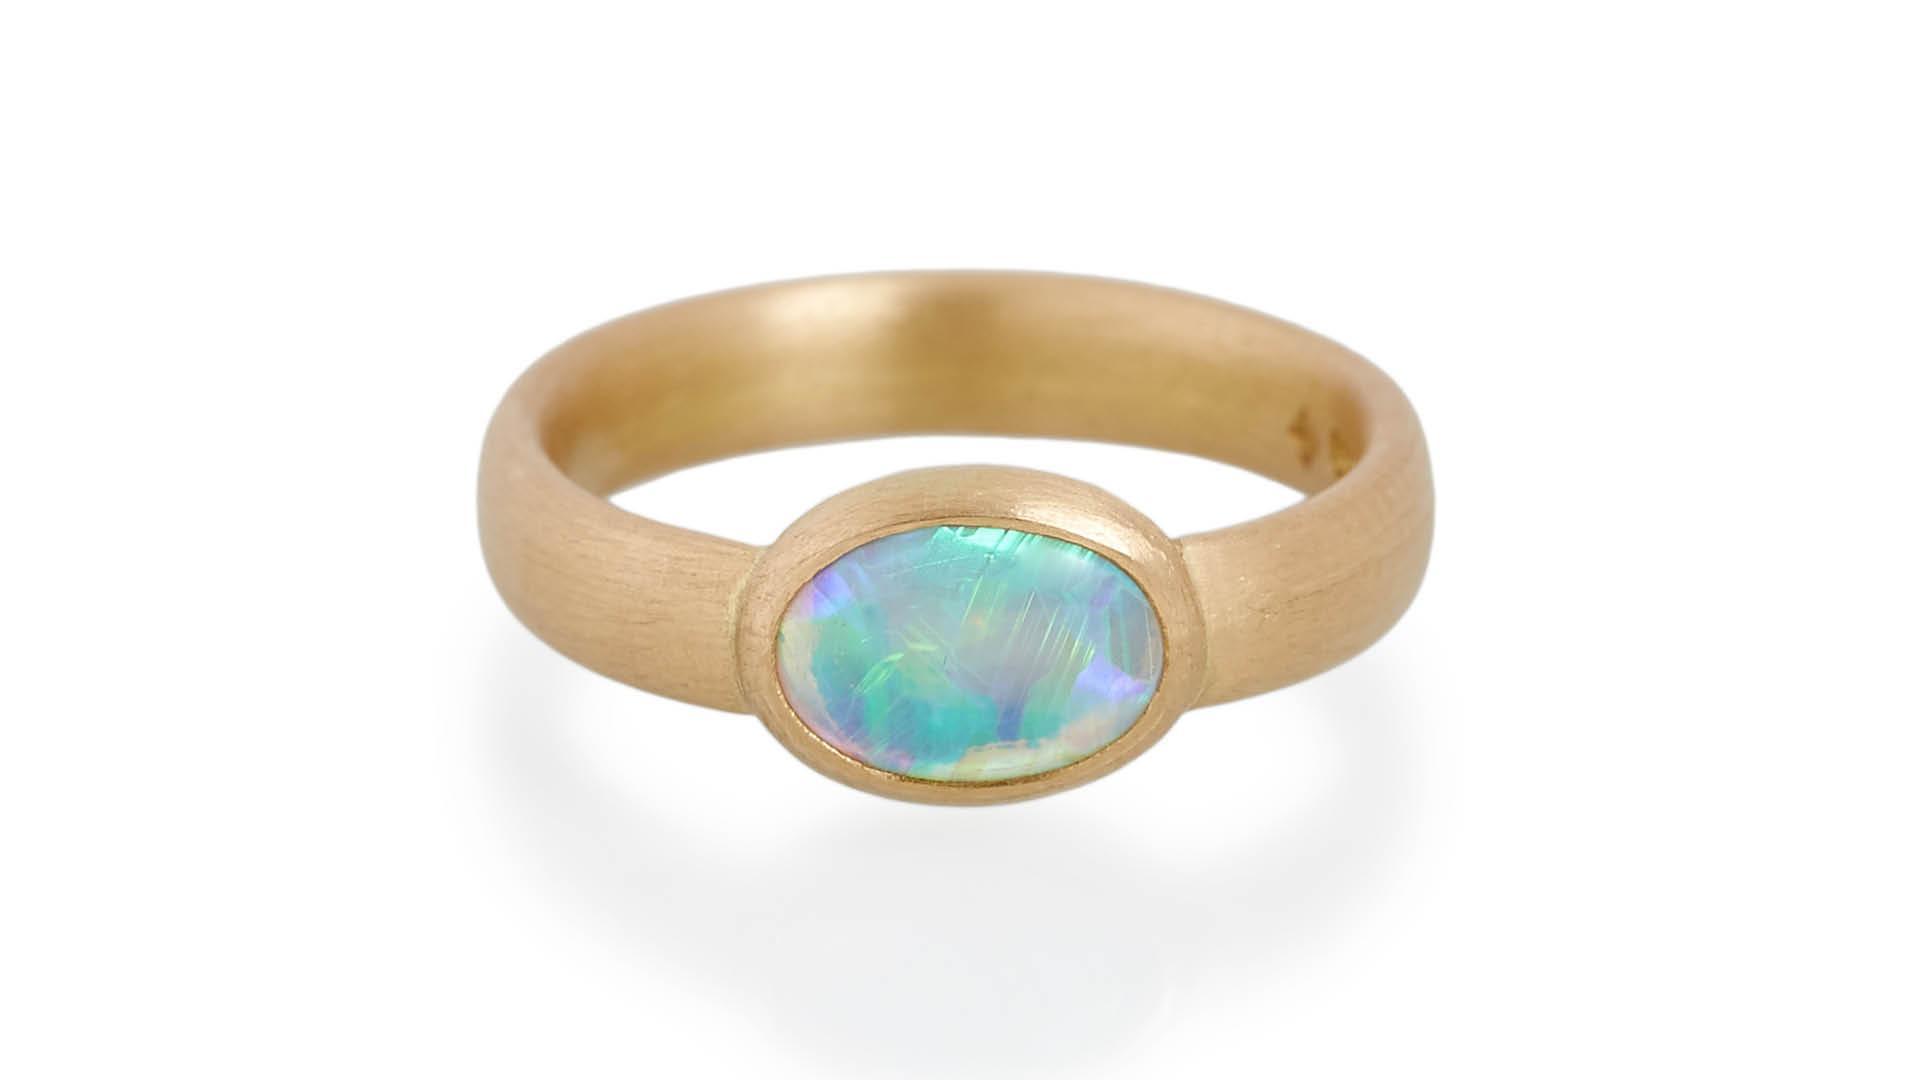 Cadby & Co Opal ring